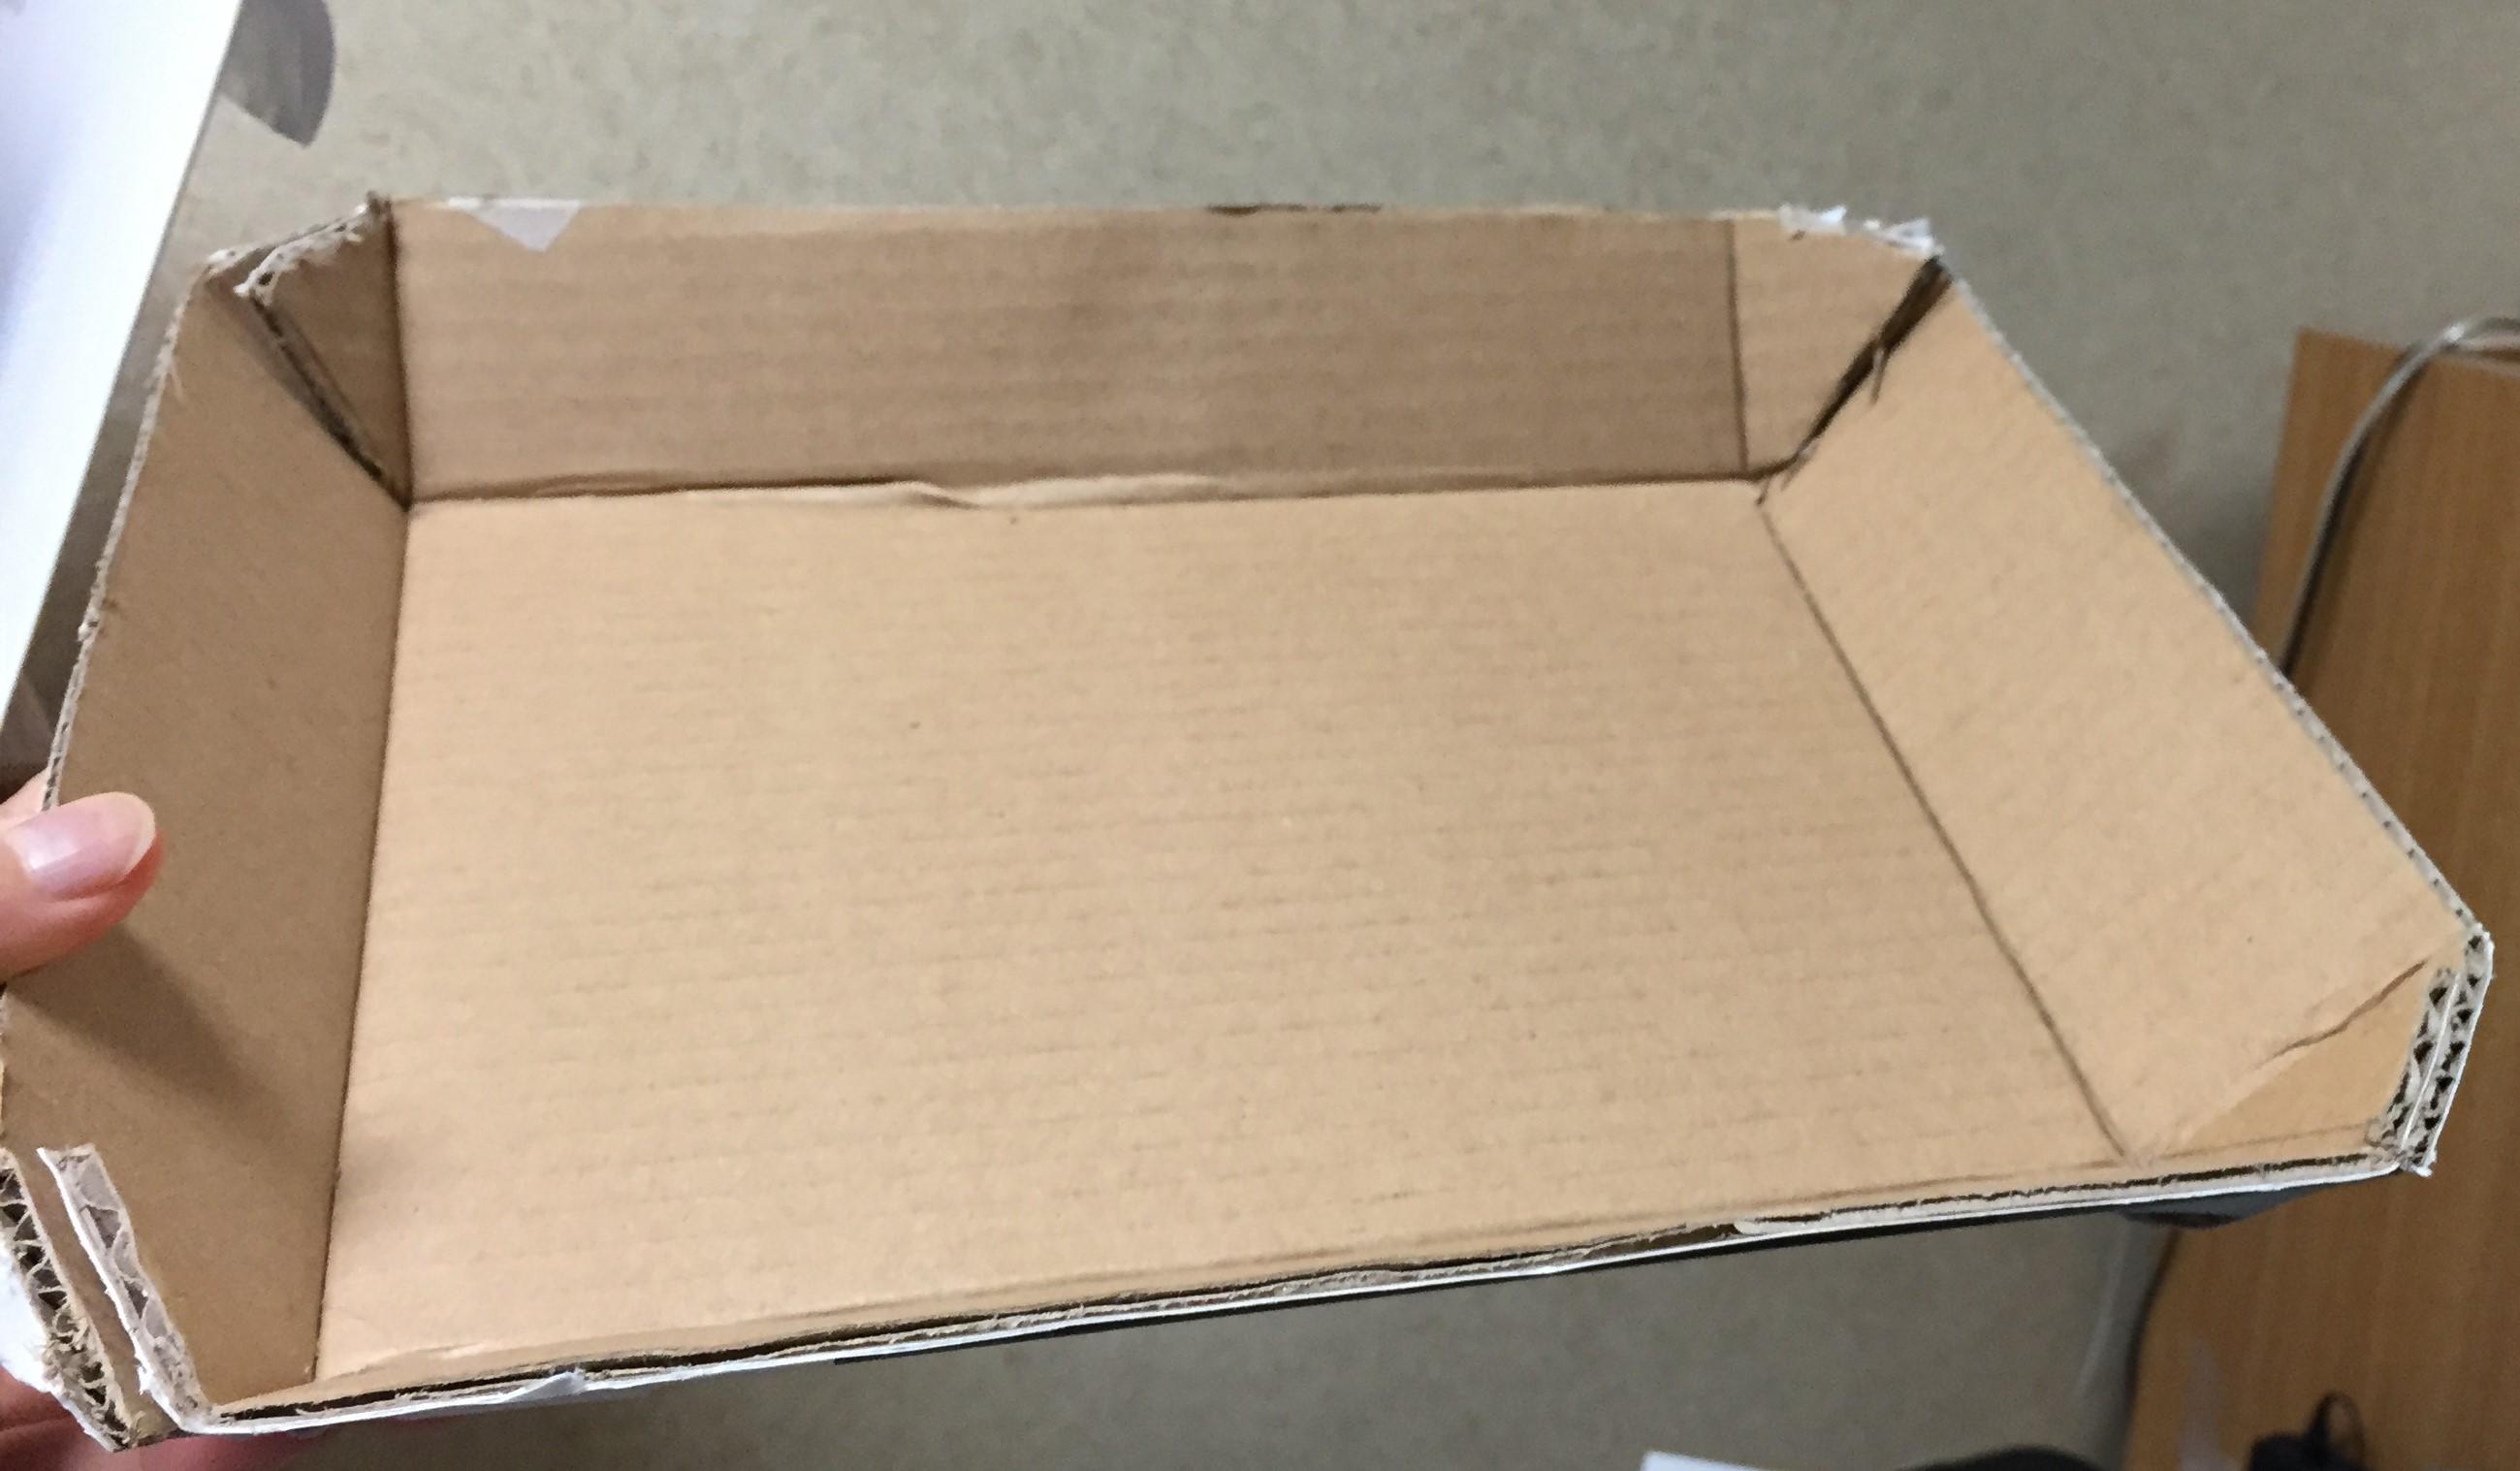 Cardboard prototype 1